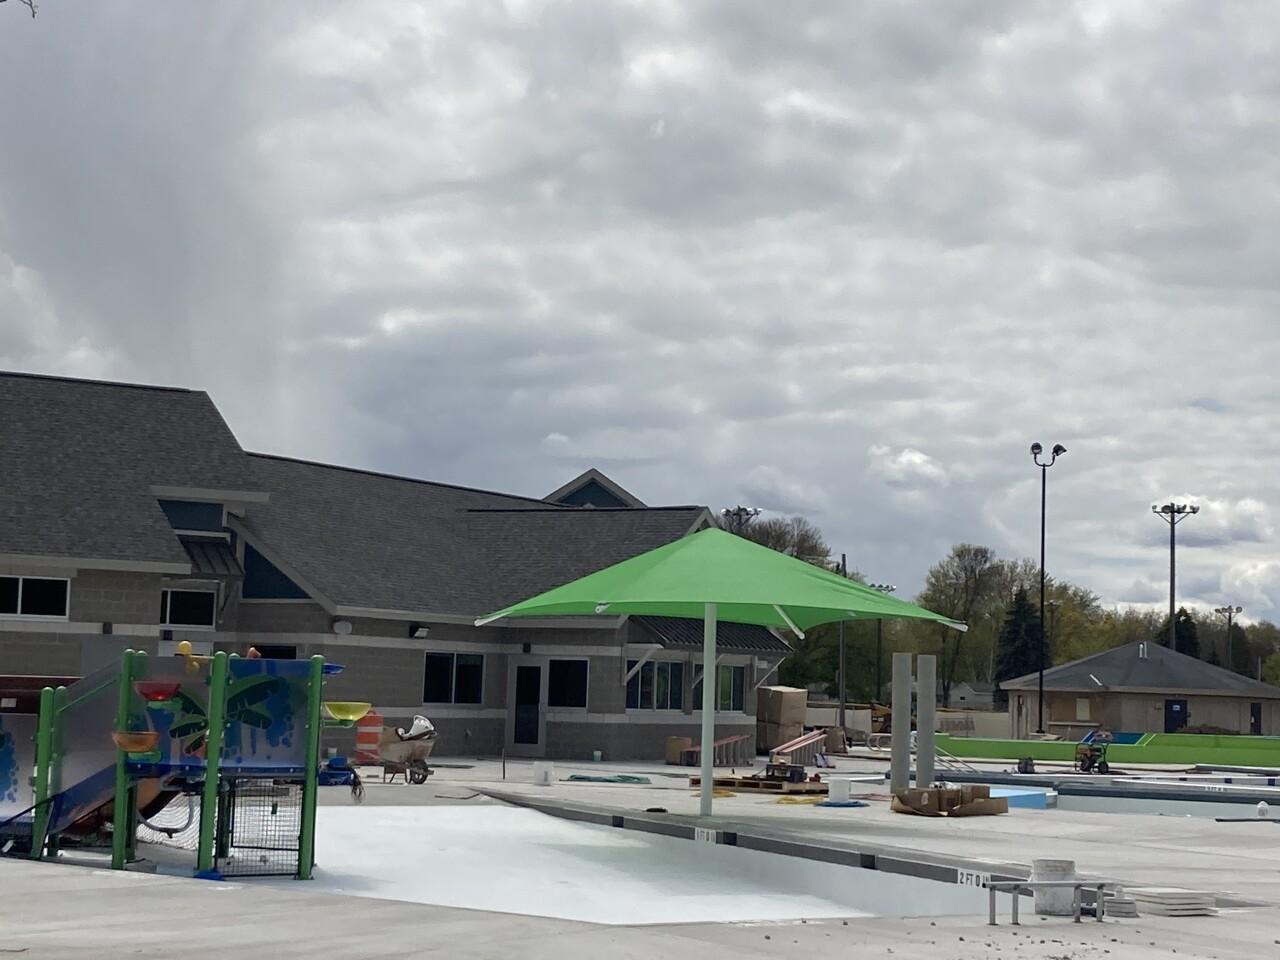 VFW Aquatic Center